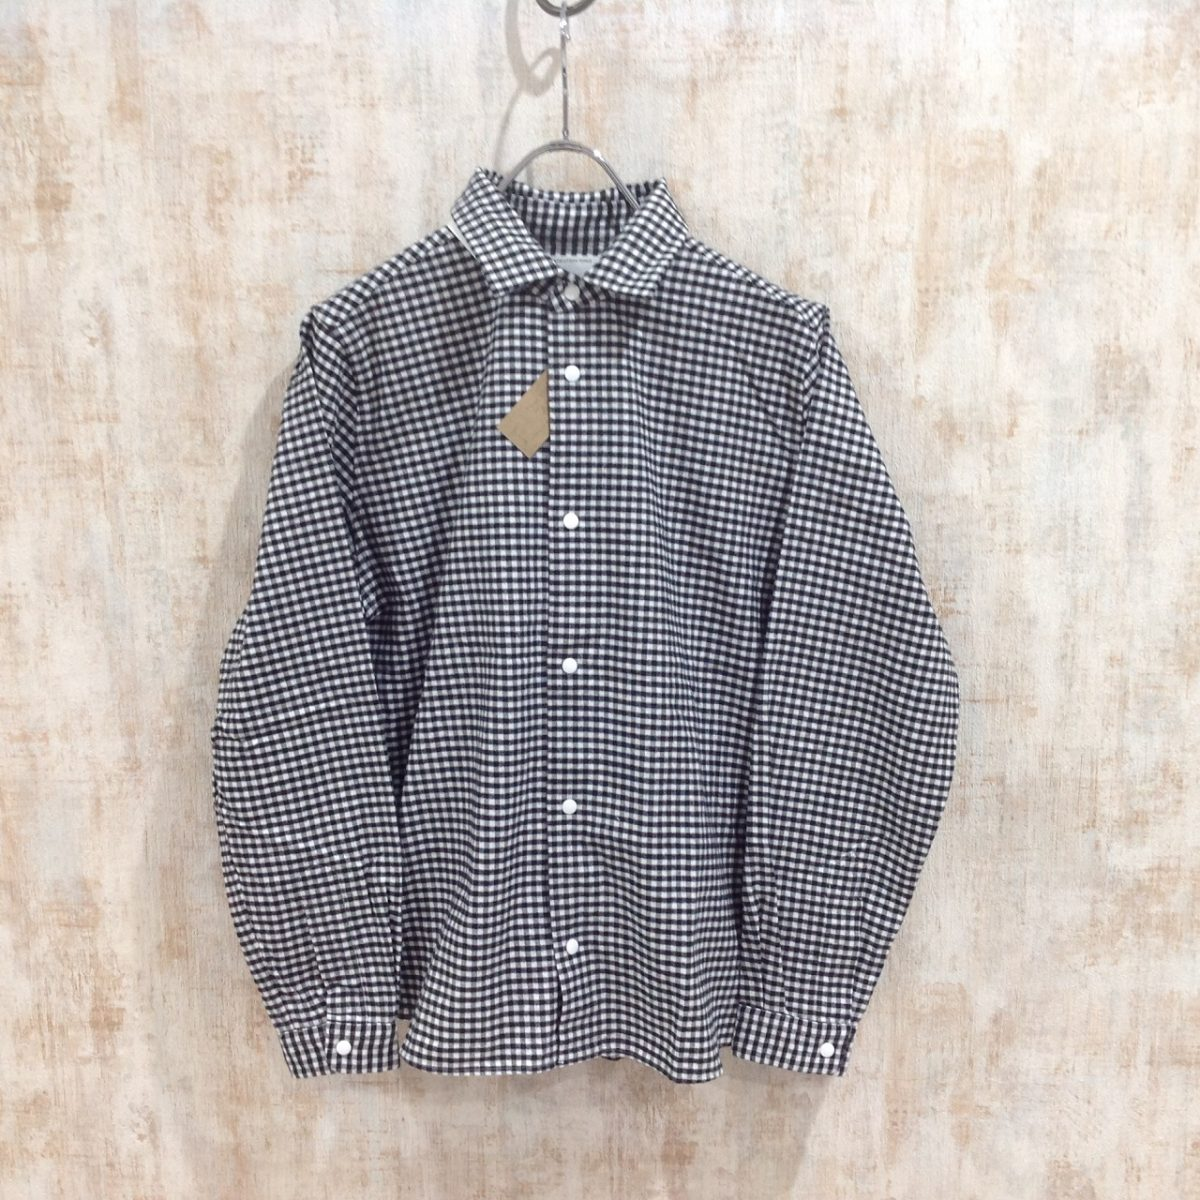 YAECAのコンフォートシャツcomfort shirt